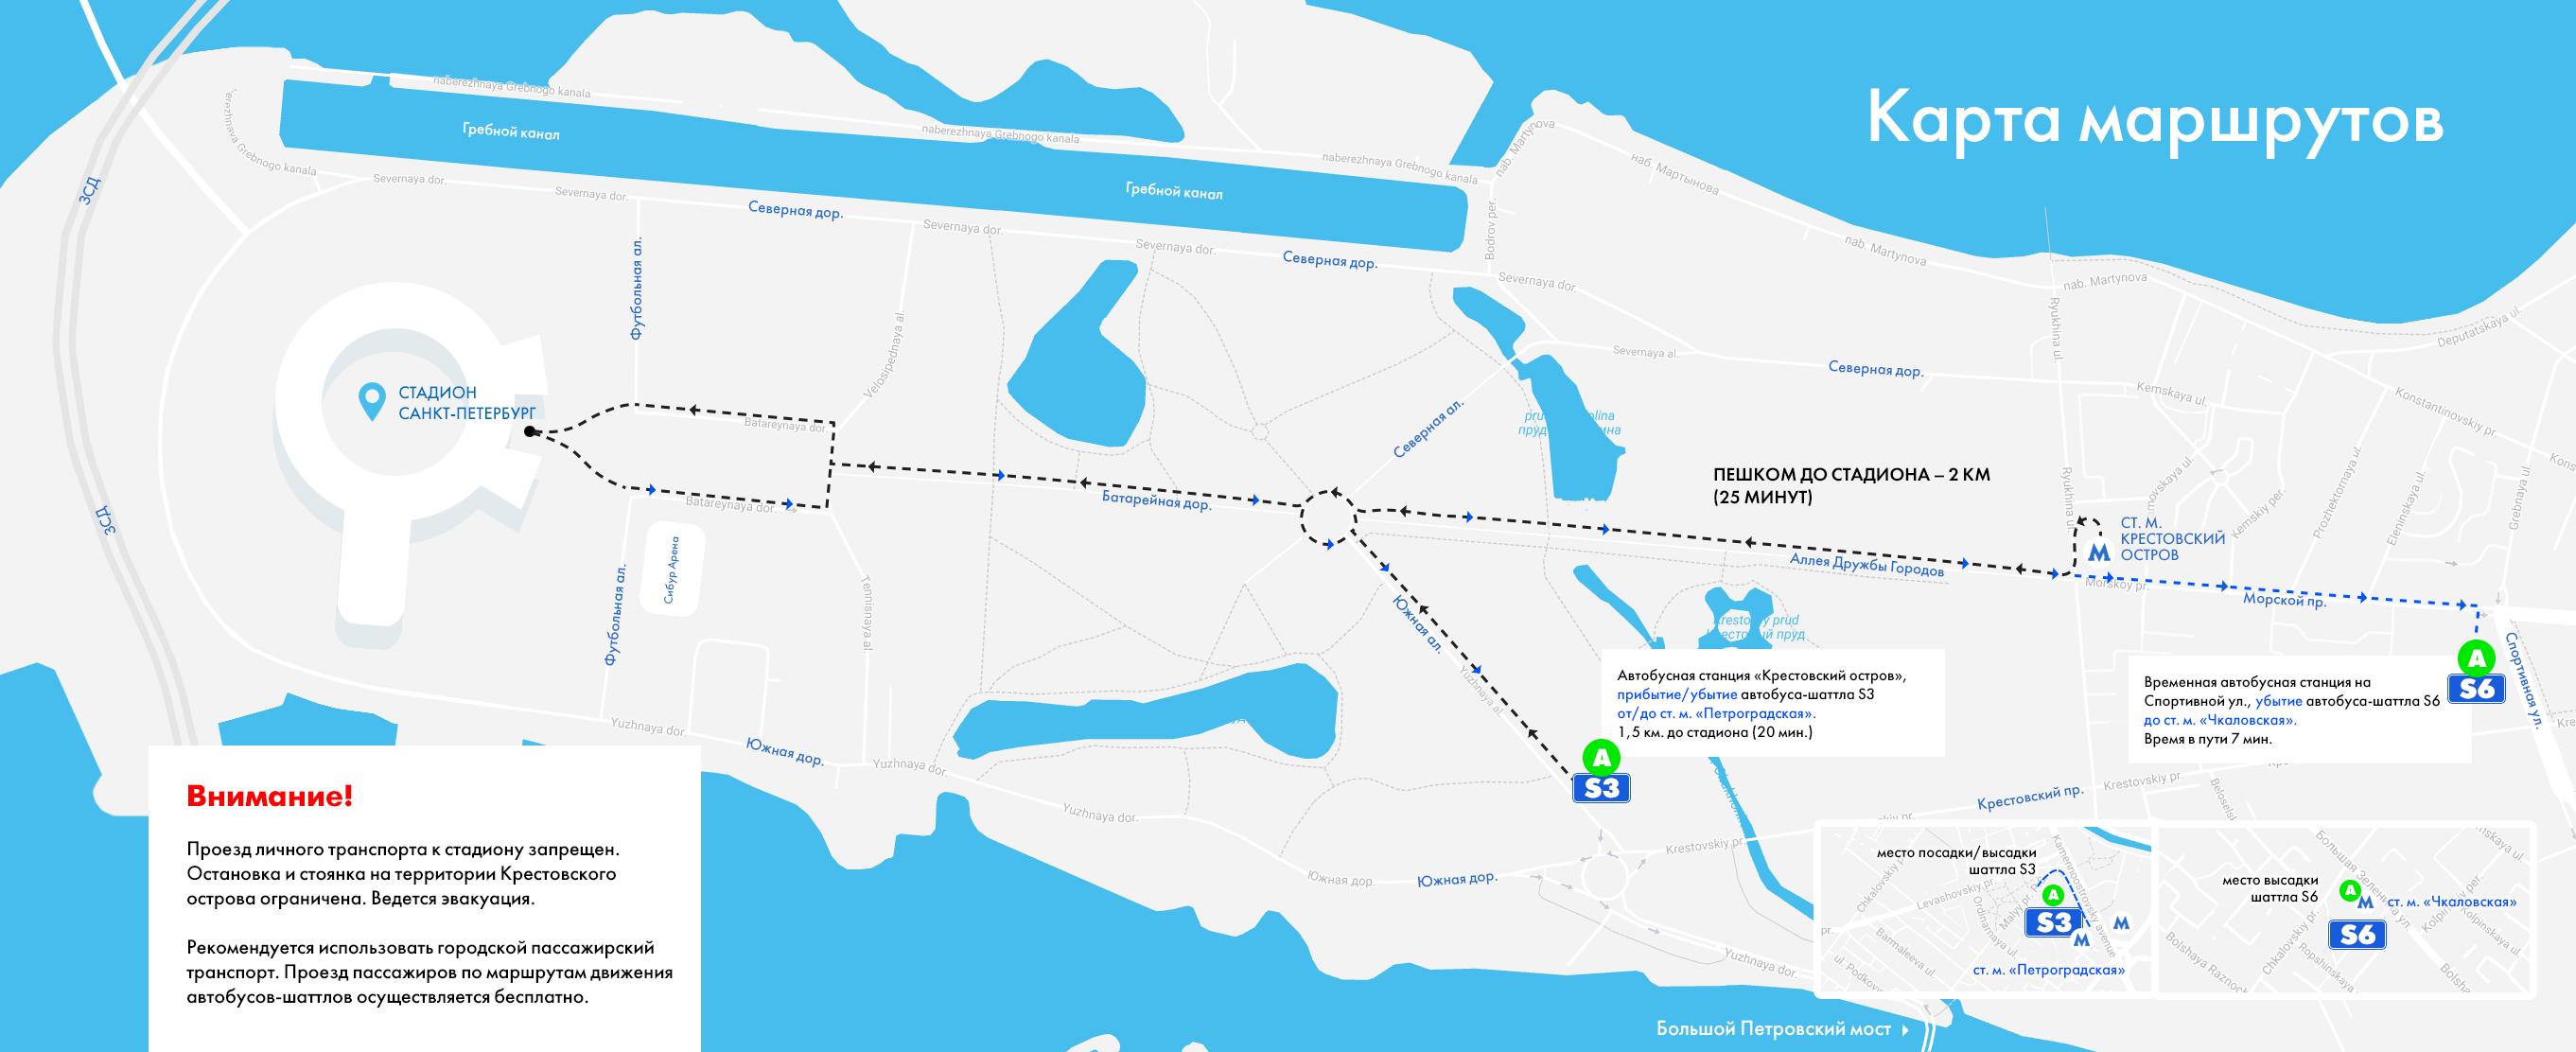 Схема проезда к новому стадиону Зенита